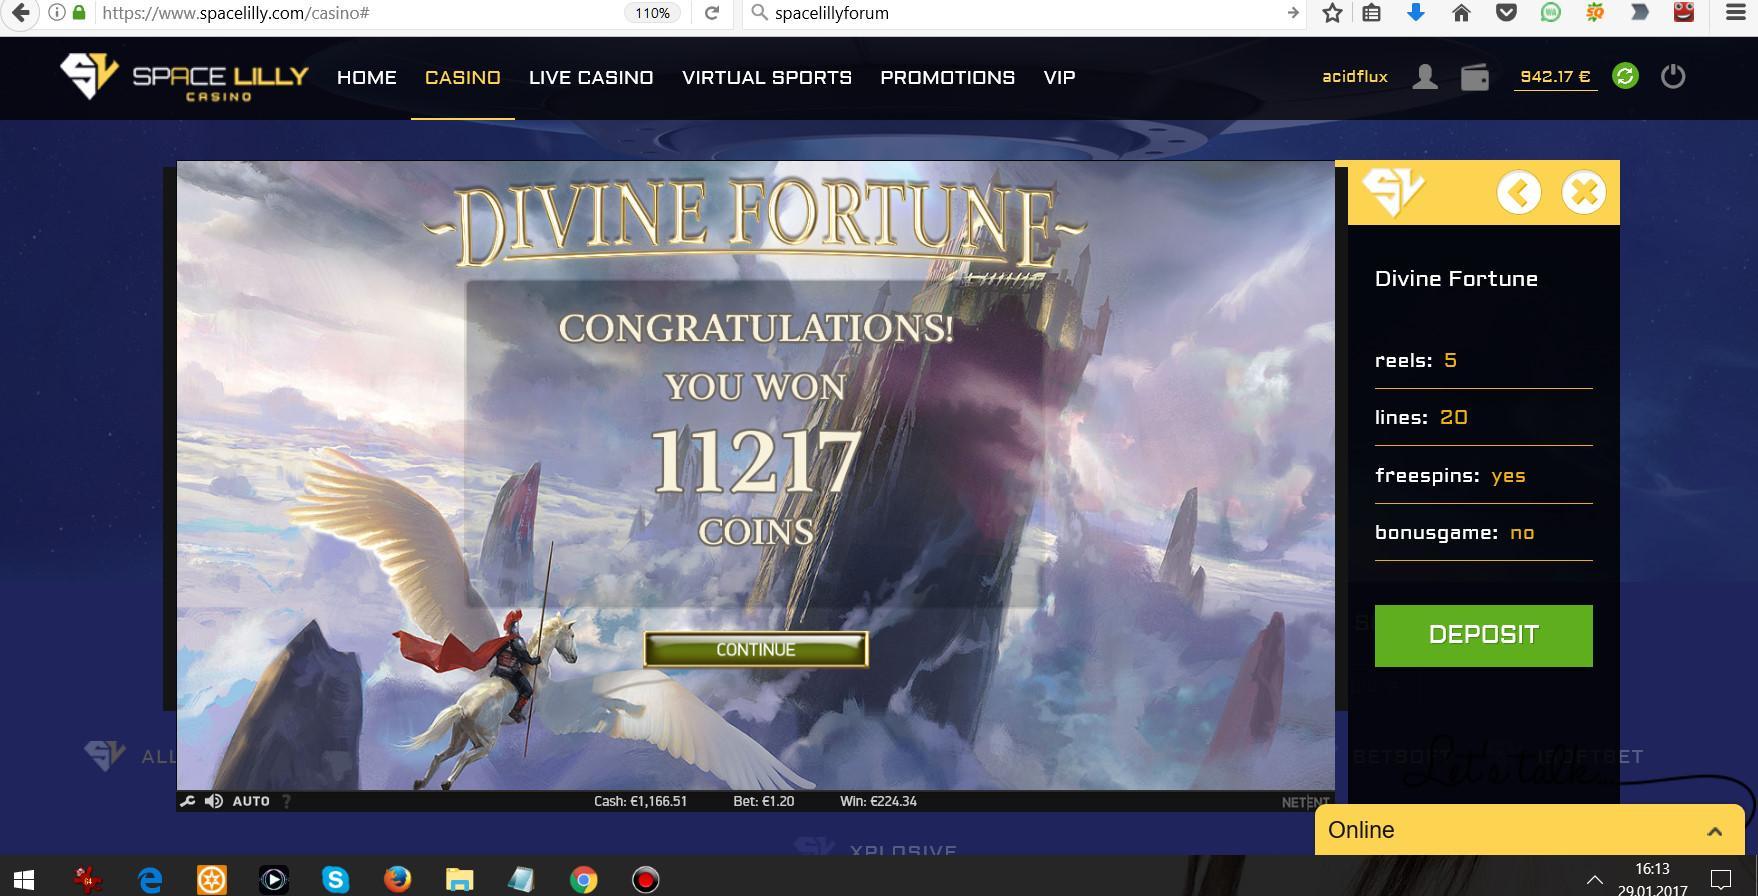 29.01.2017 - 16.13 (GMT+1) Divine Fortune